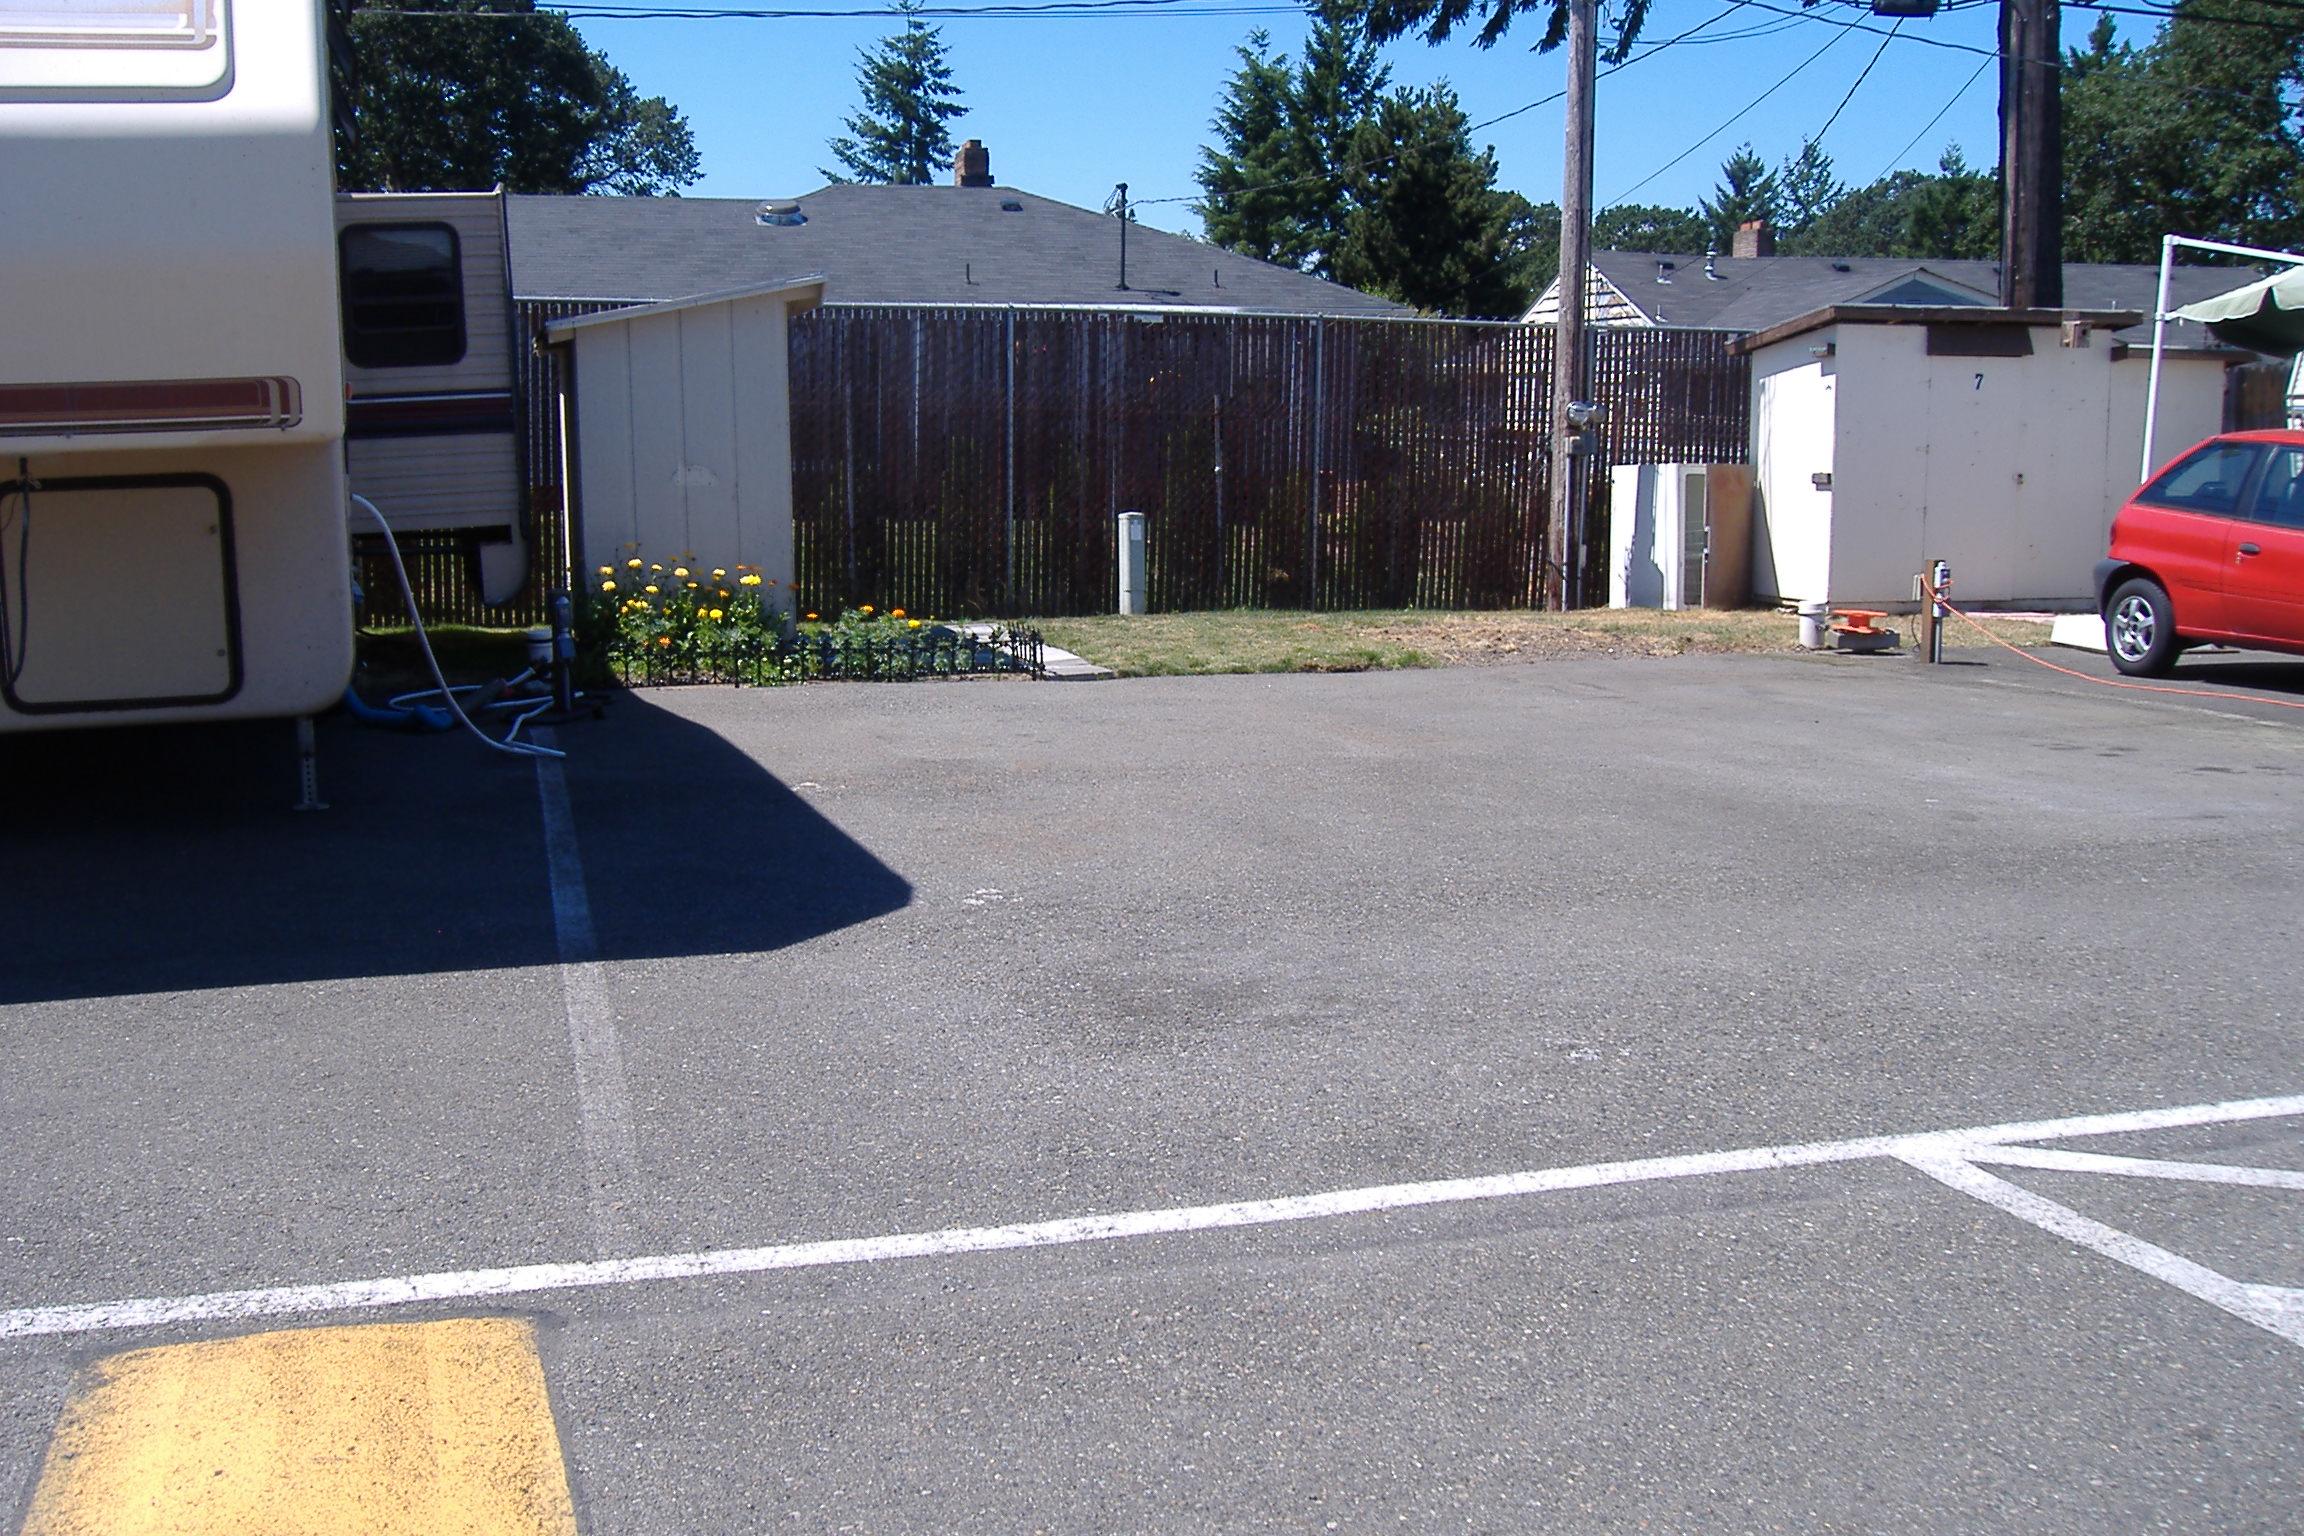 Oaknoll Rv Park 10404 S Tacoma Way Lakewood Wa 98499